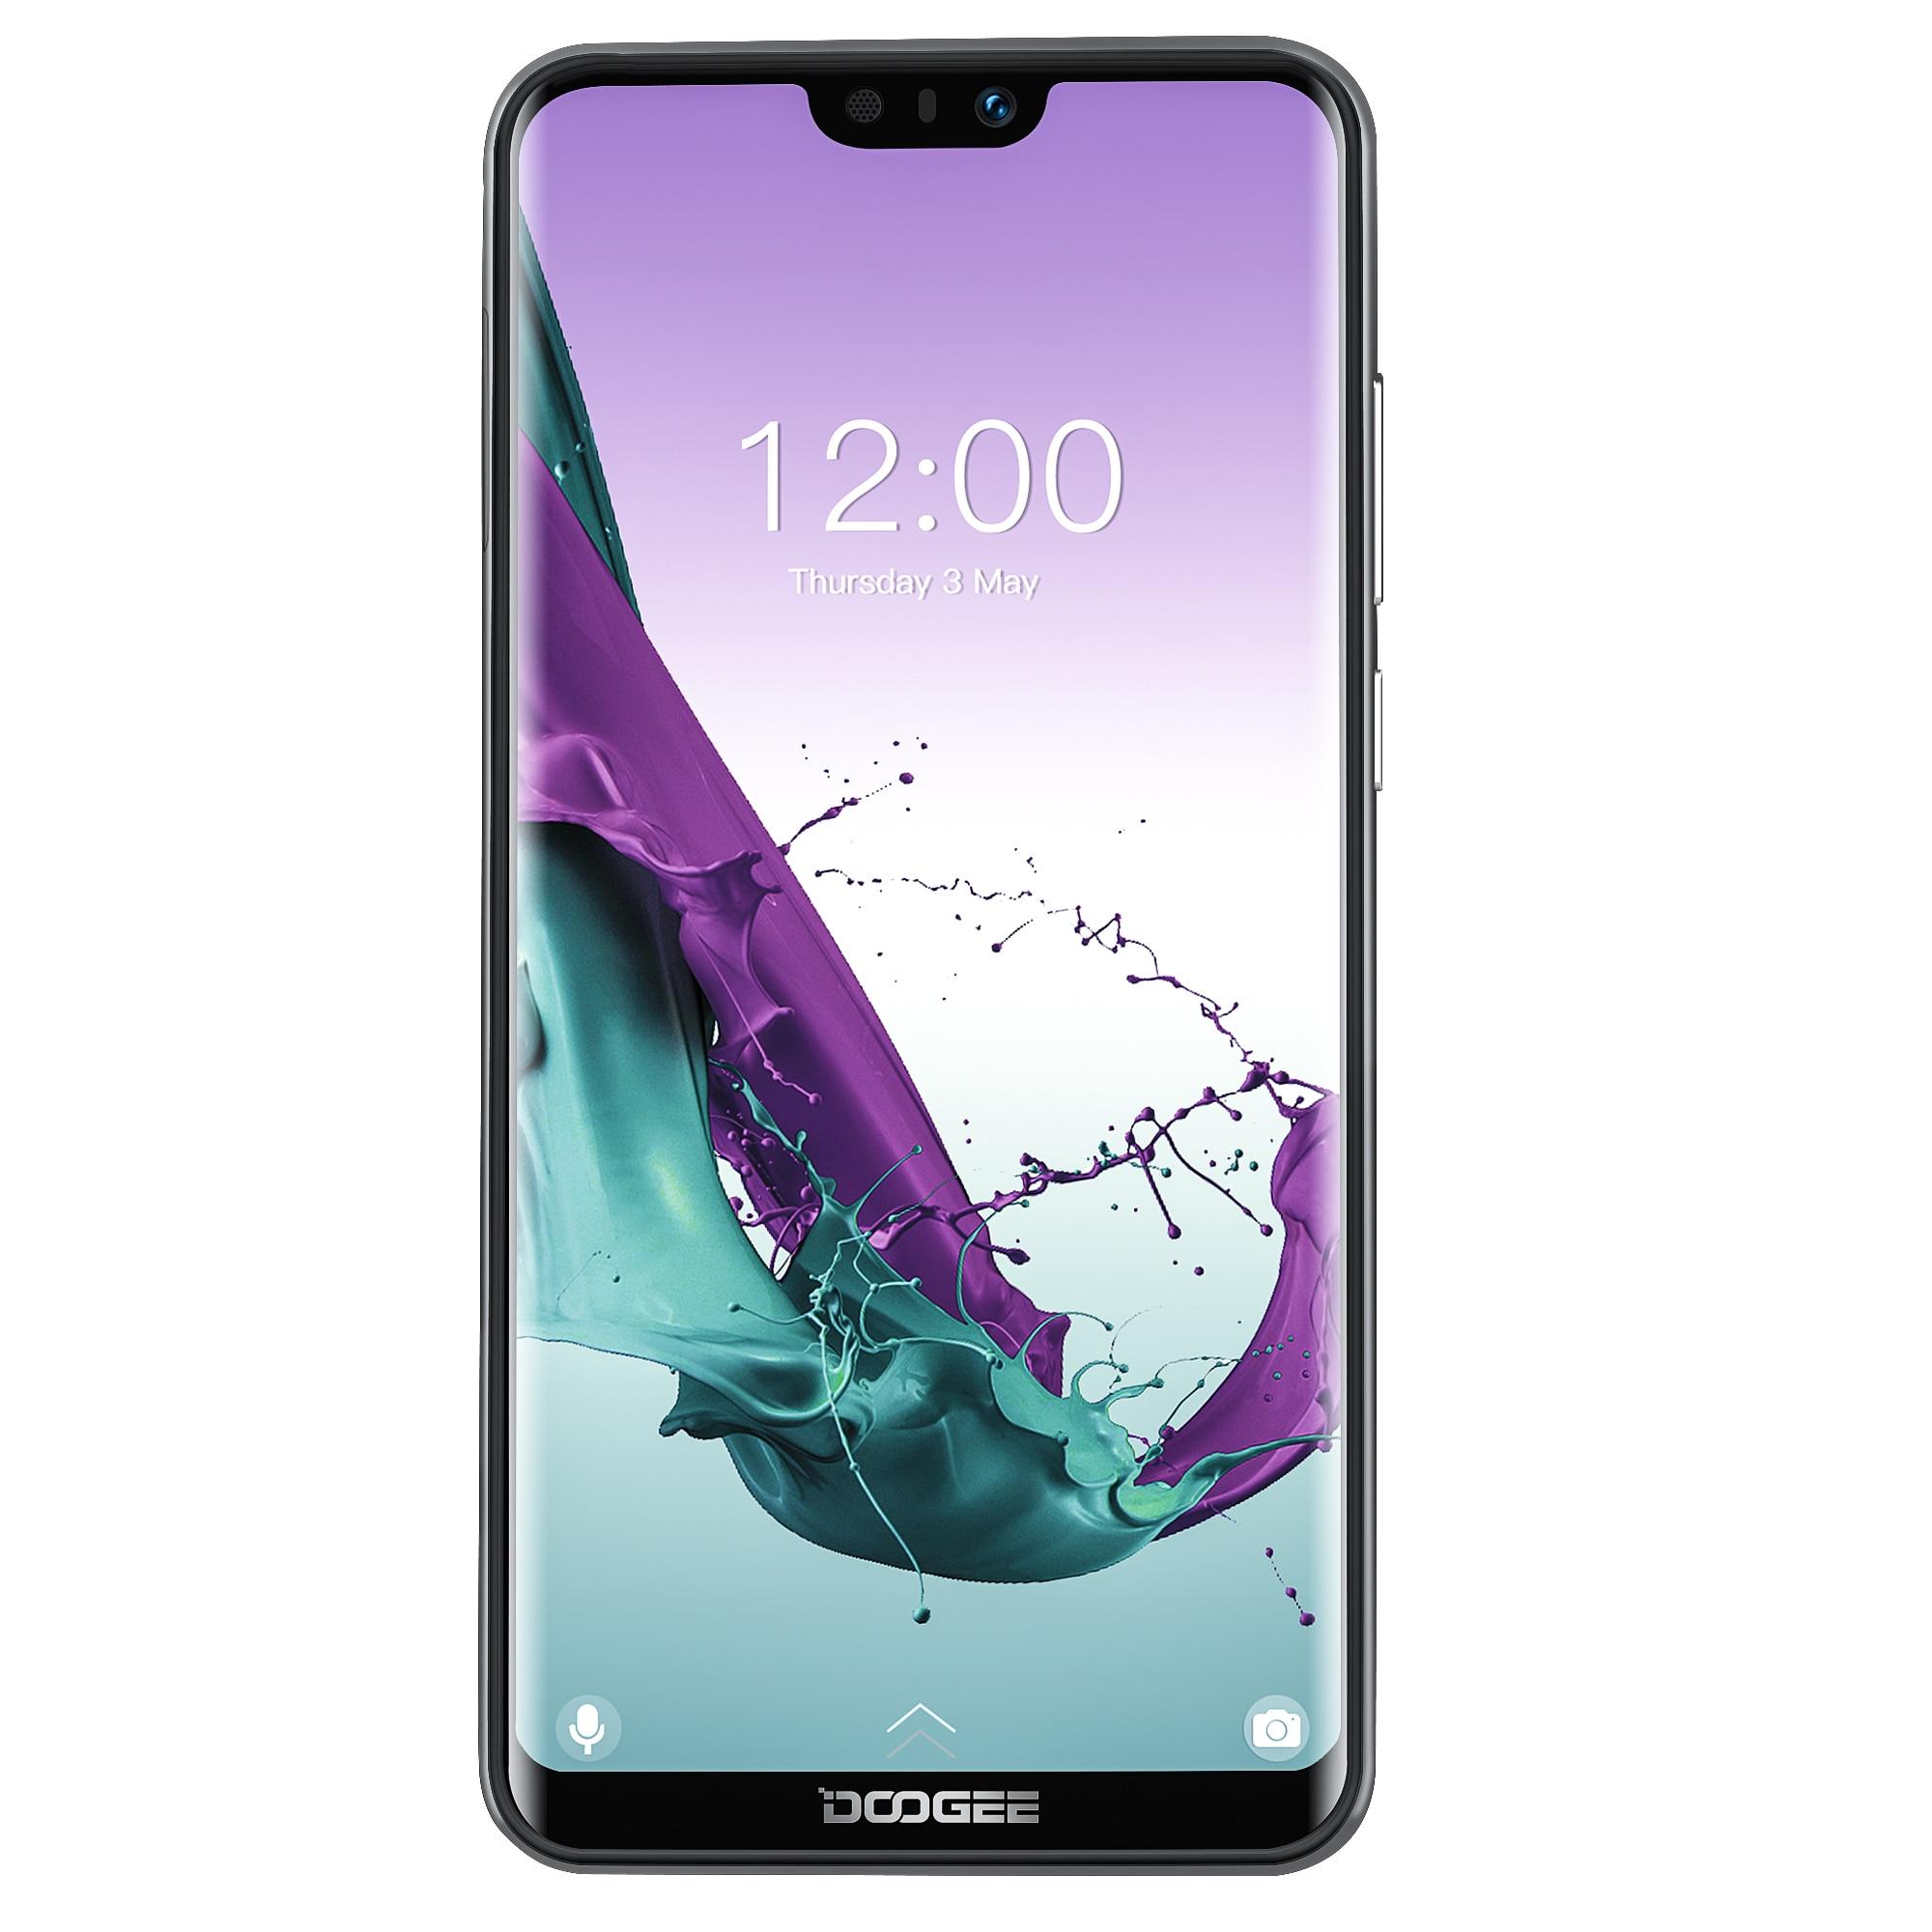 Doogee n10 2019 android 8.14g lte telefone móvel 5.84 polegada octa núcleo 3 gb ram 32 gb rom fhd 19:9 display 16.0mp câmera frontal 3360 mah